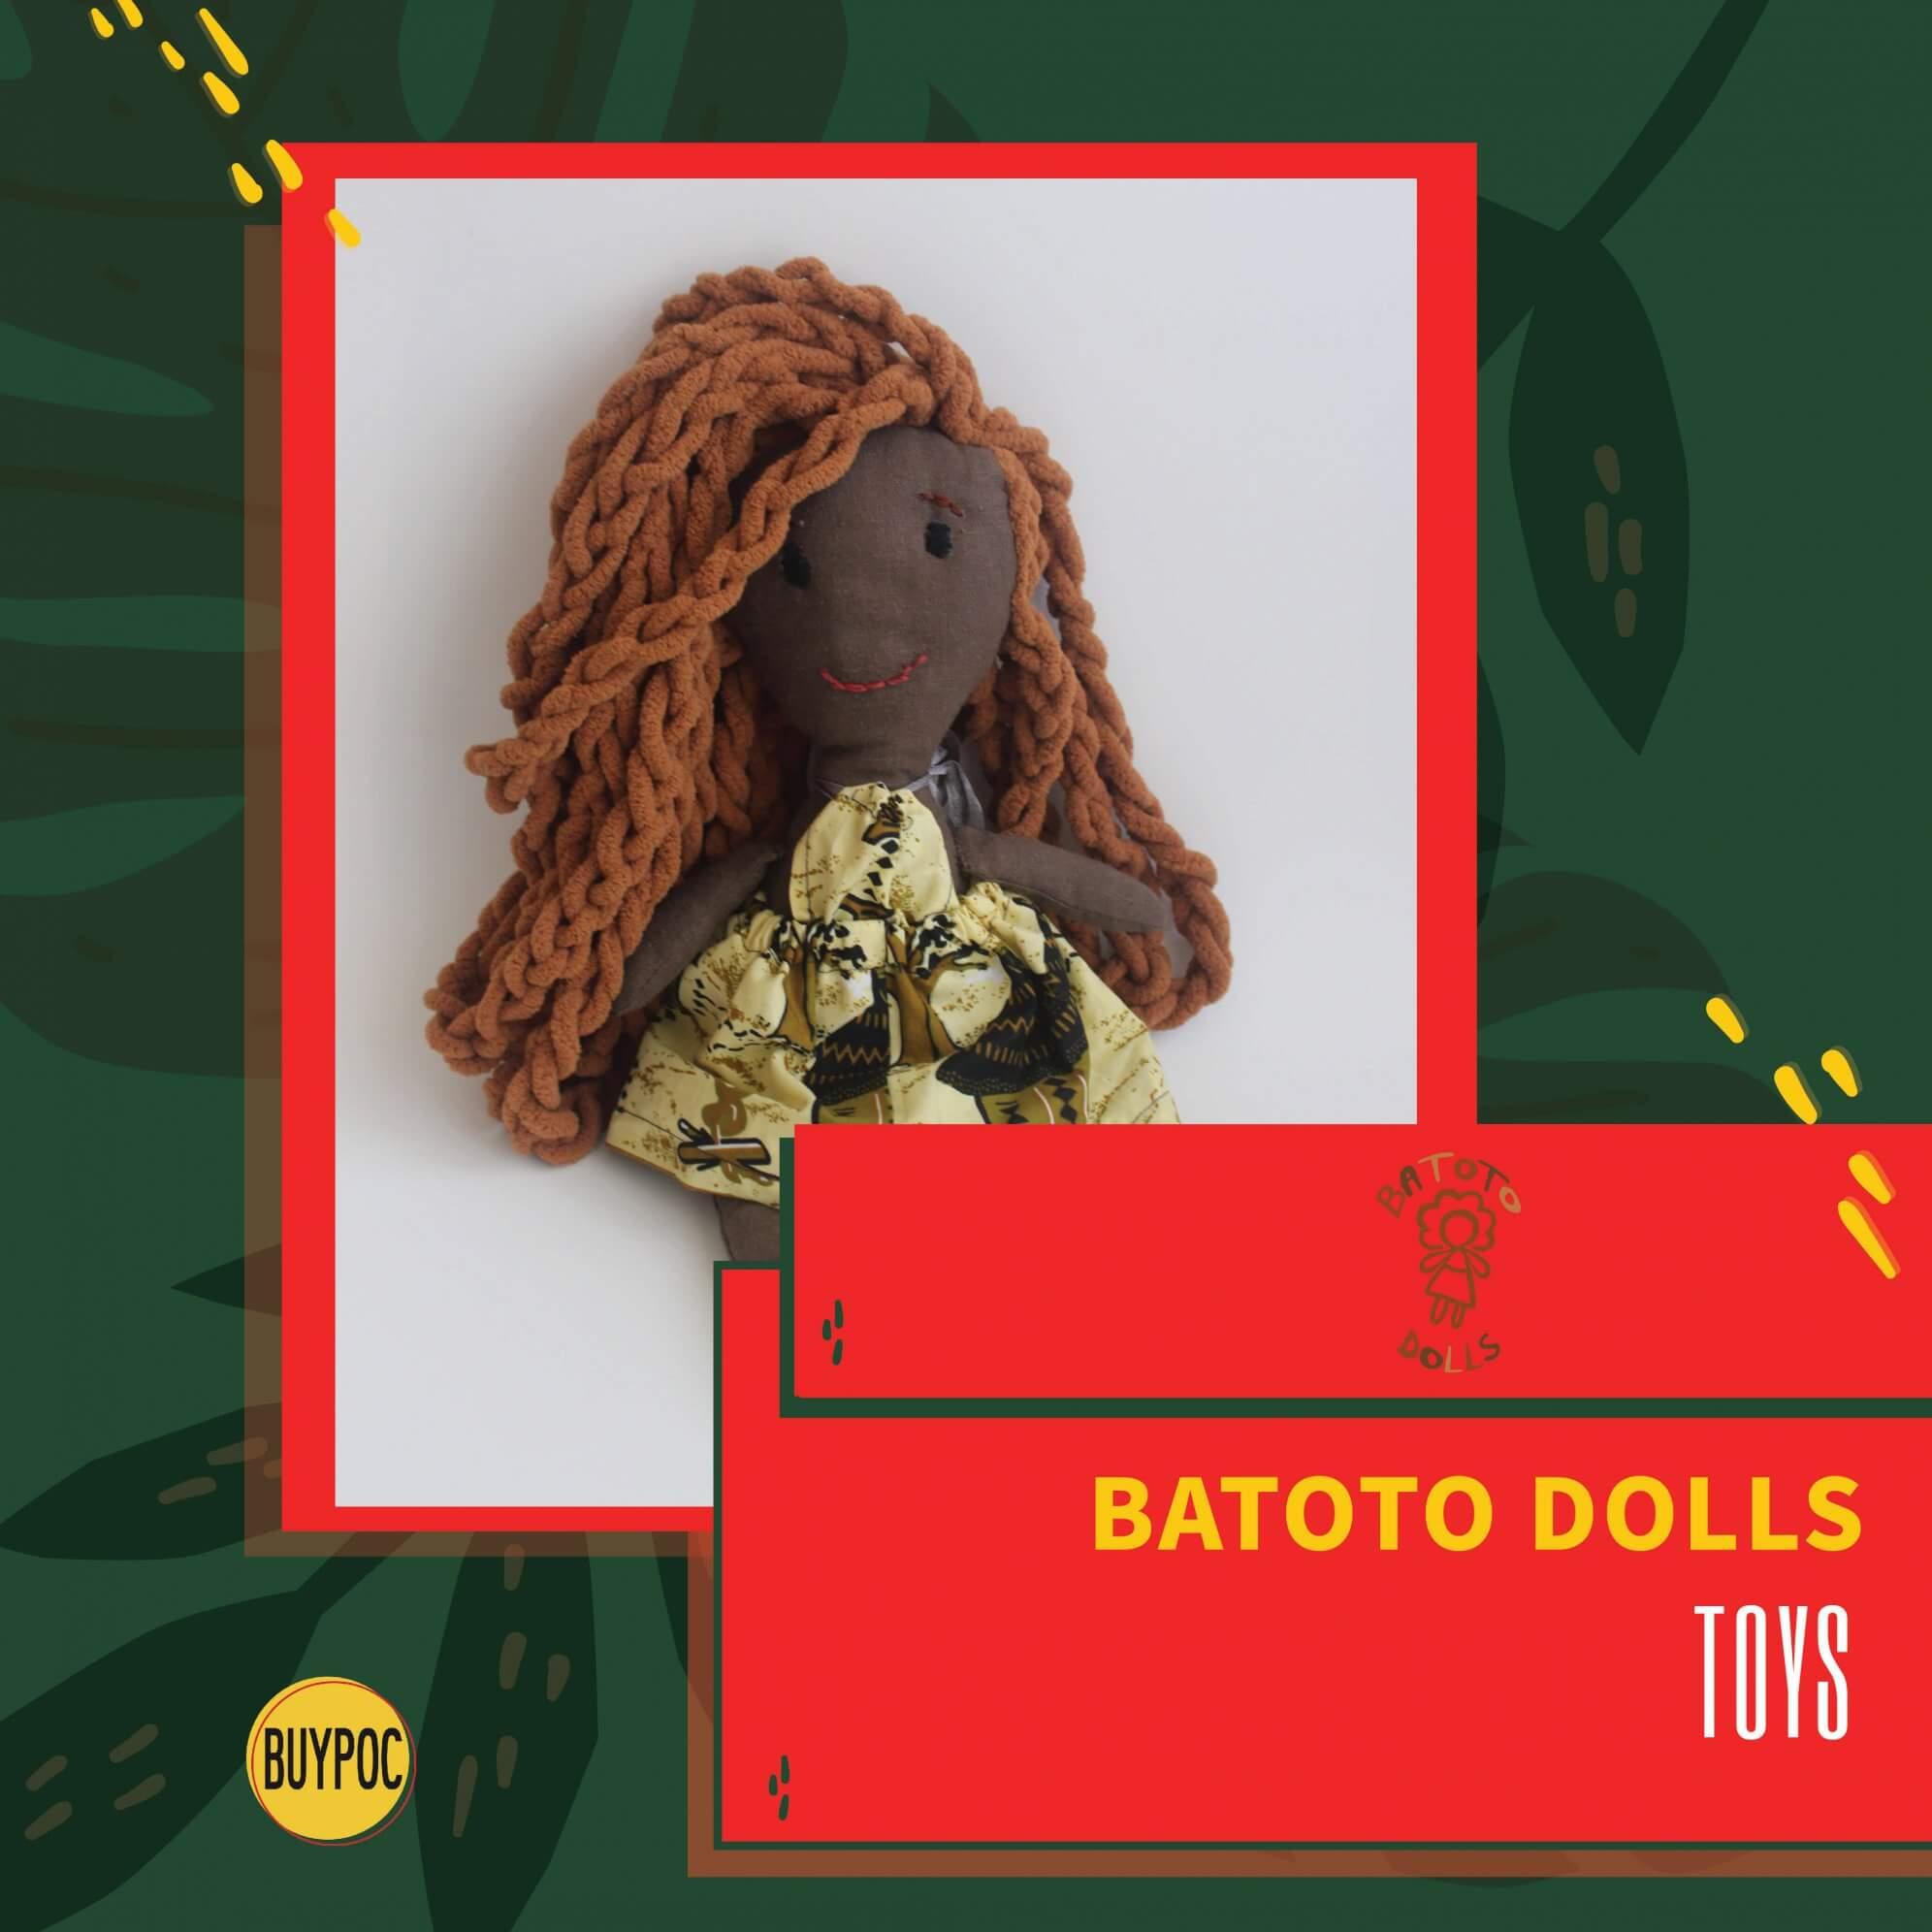 Batoto Dolls